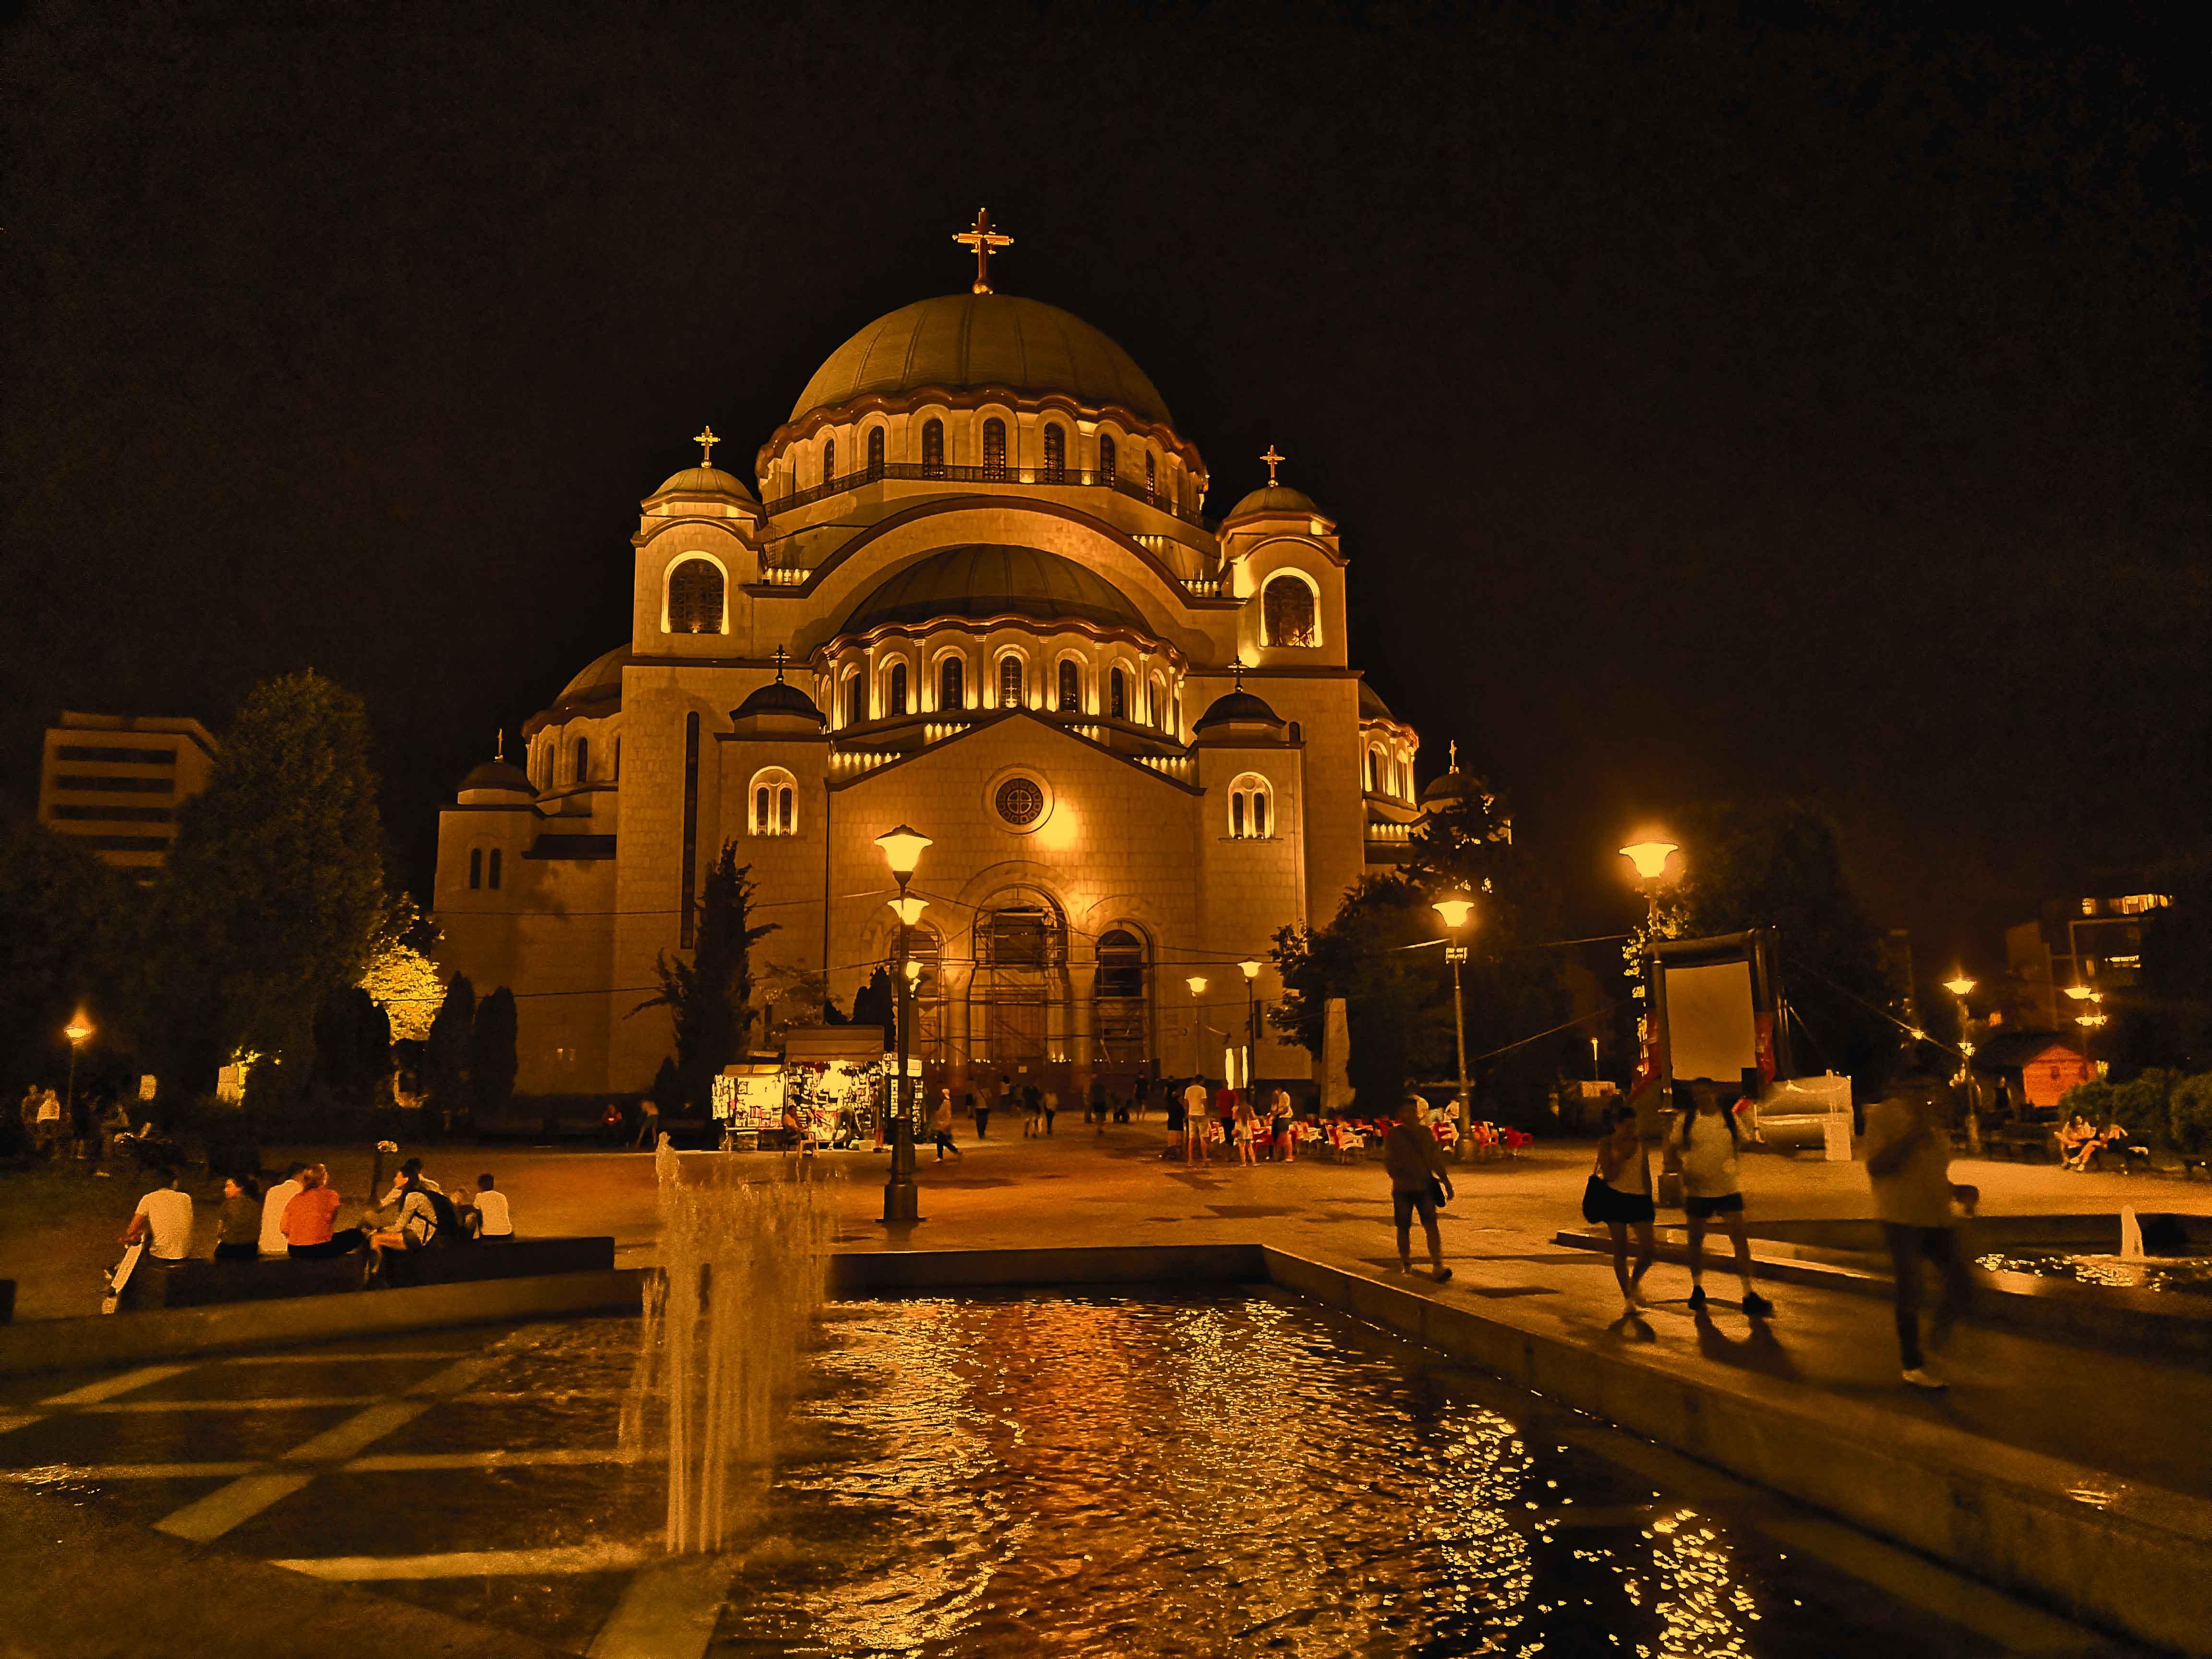 The Saint Sava Orthodox Cathedral in Belgrade